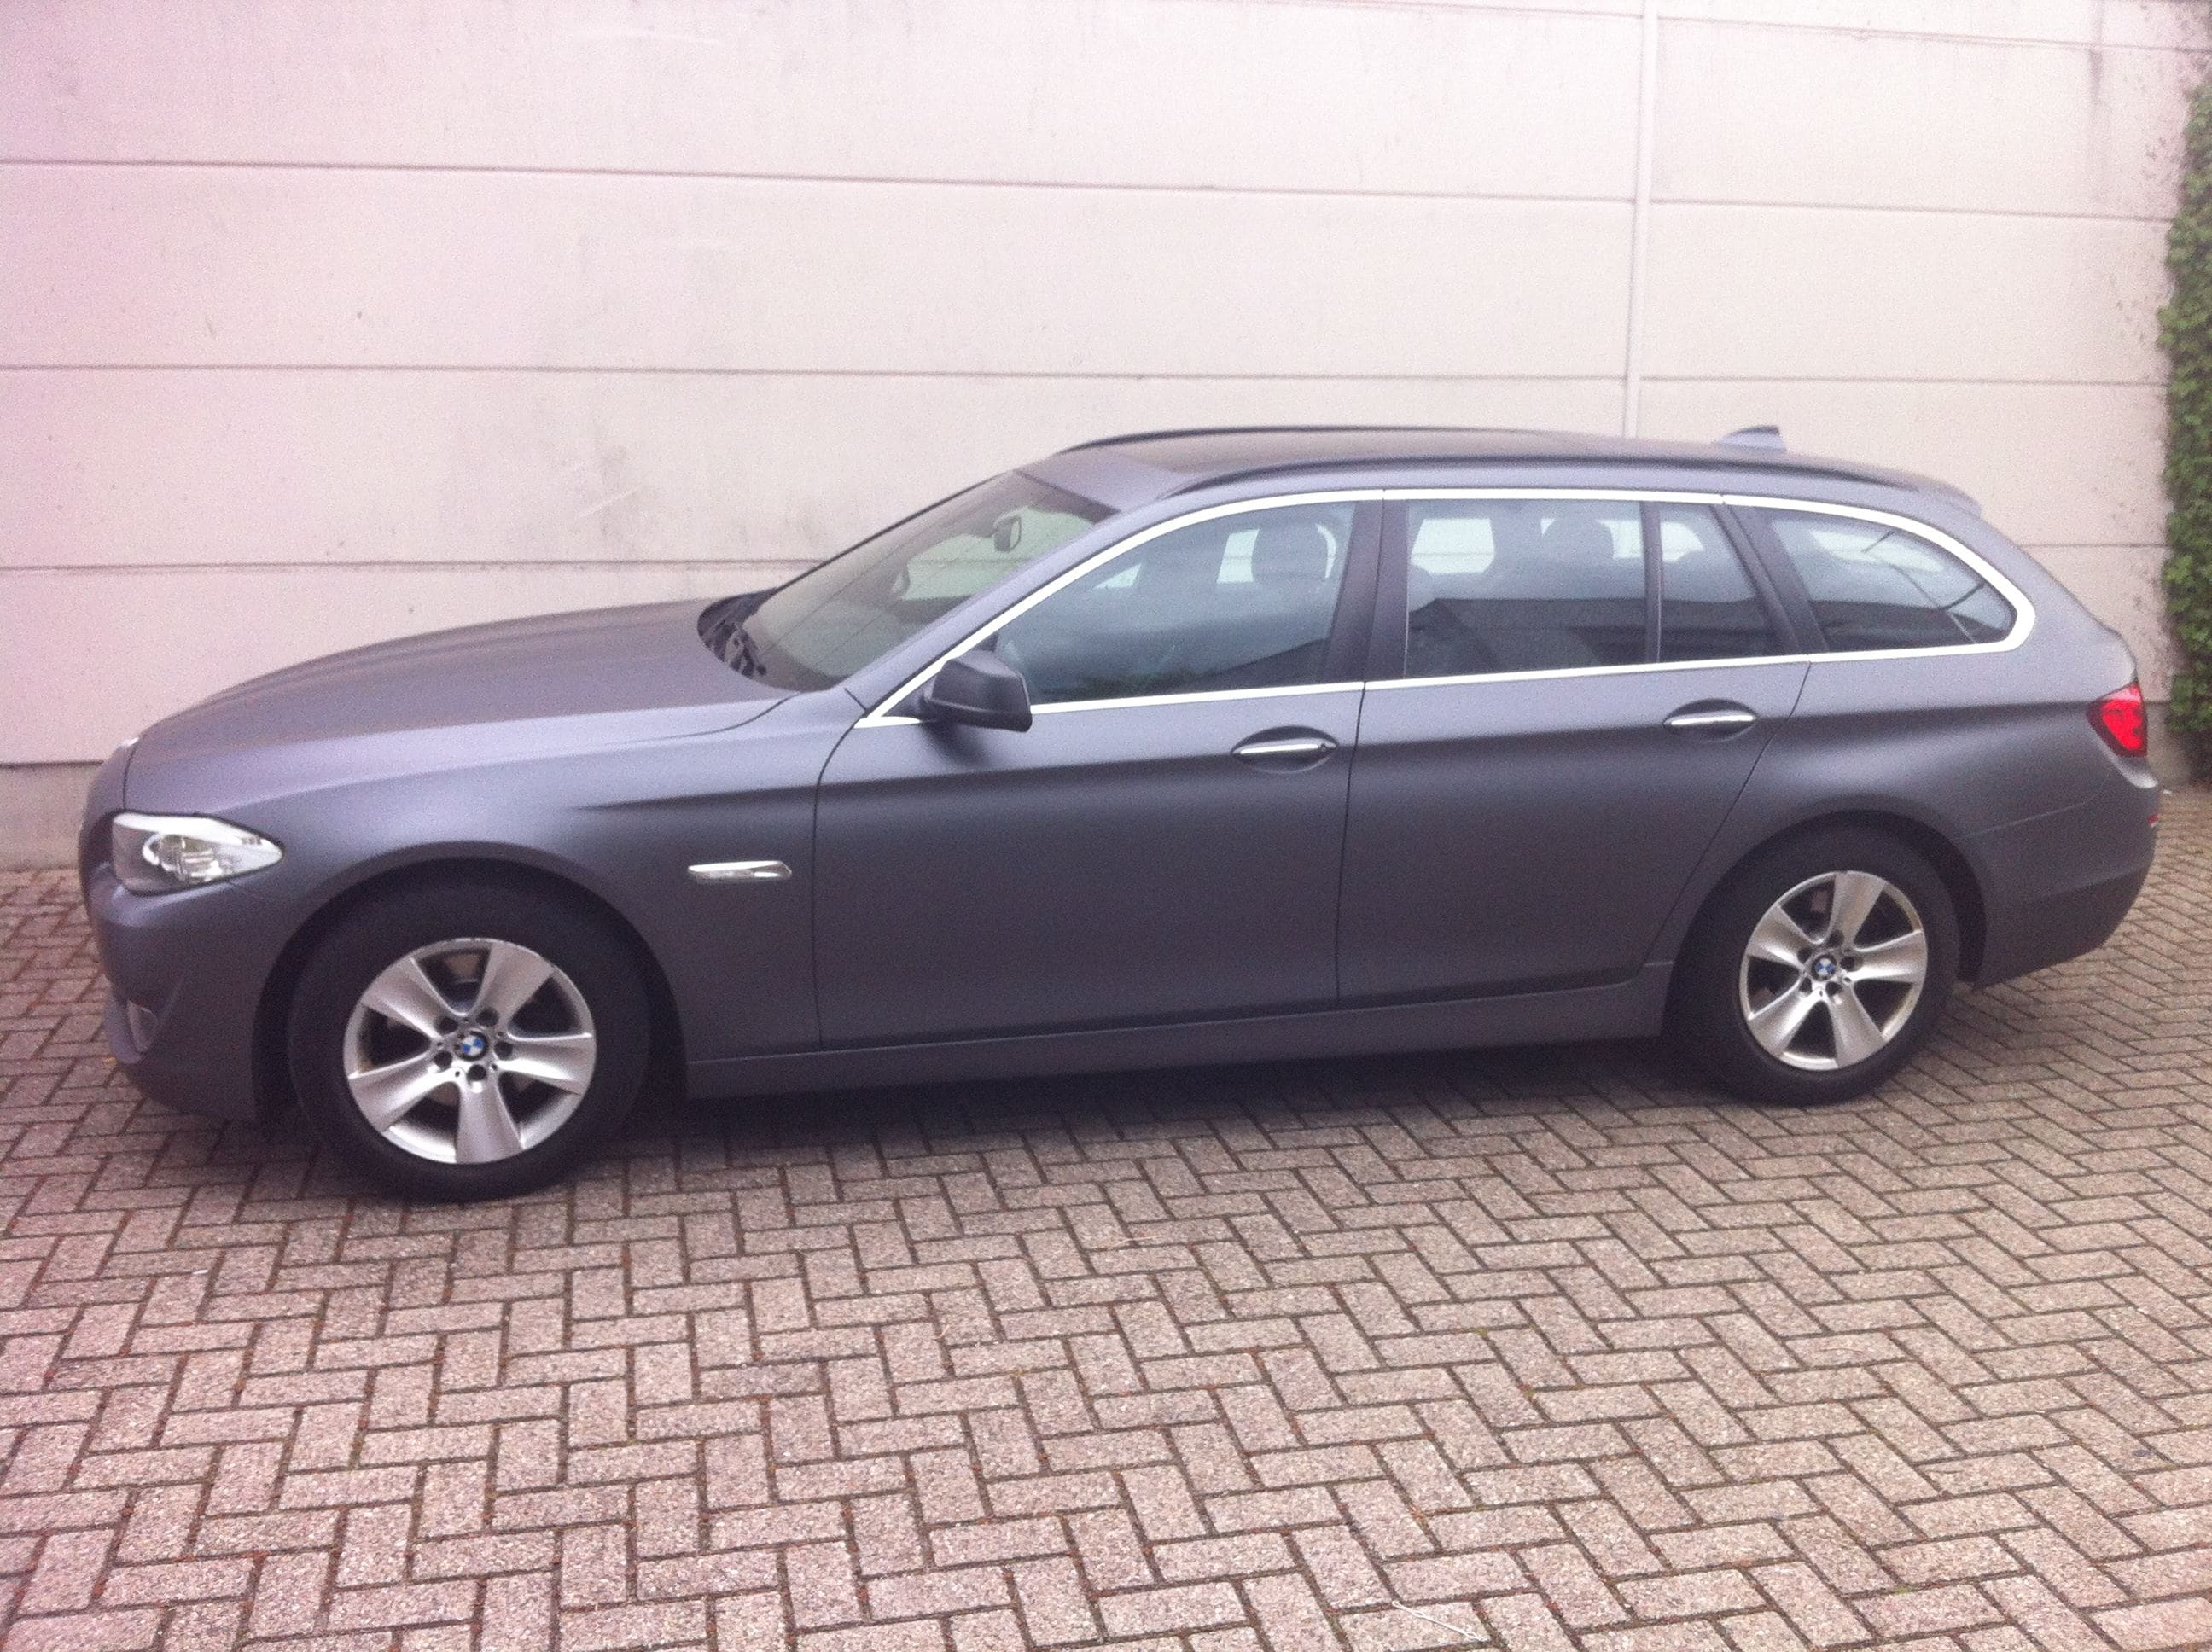 BMW 5 Serie met Gunpowder Wrap, Carwrapping door Wrapmyride.nu Foto-nr:5257, ©2021